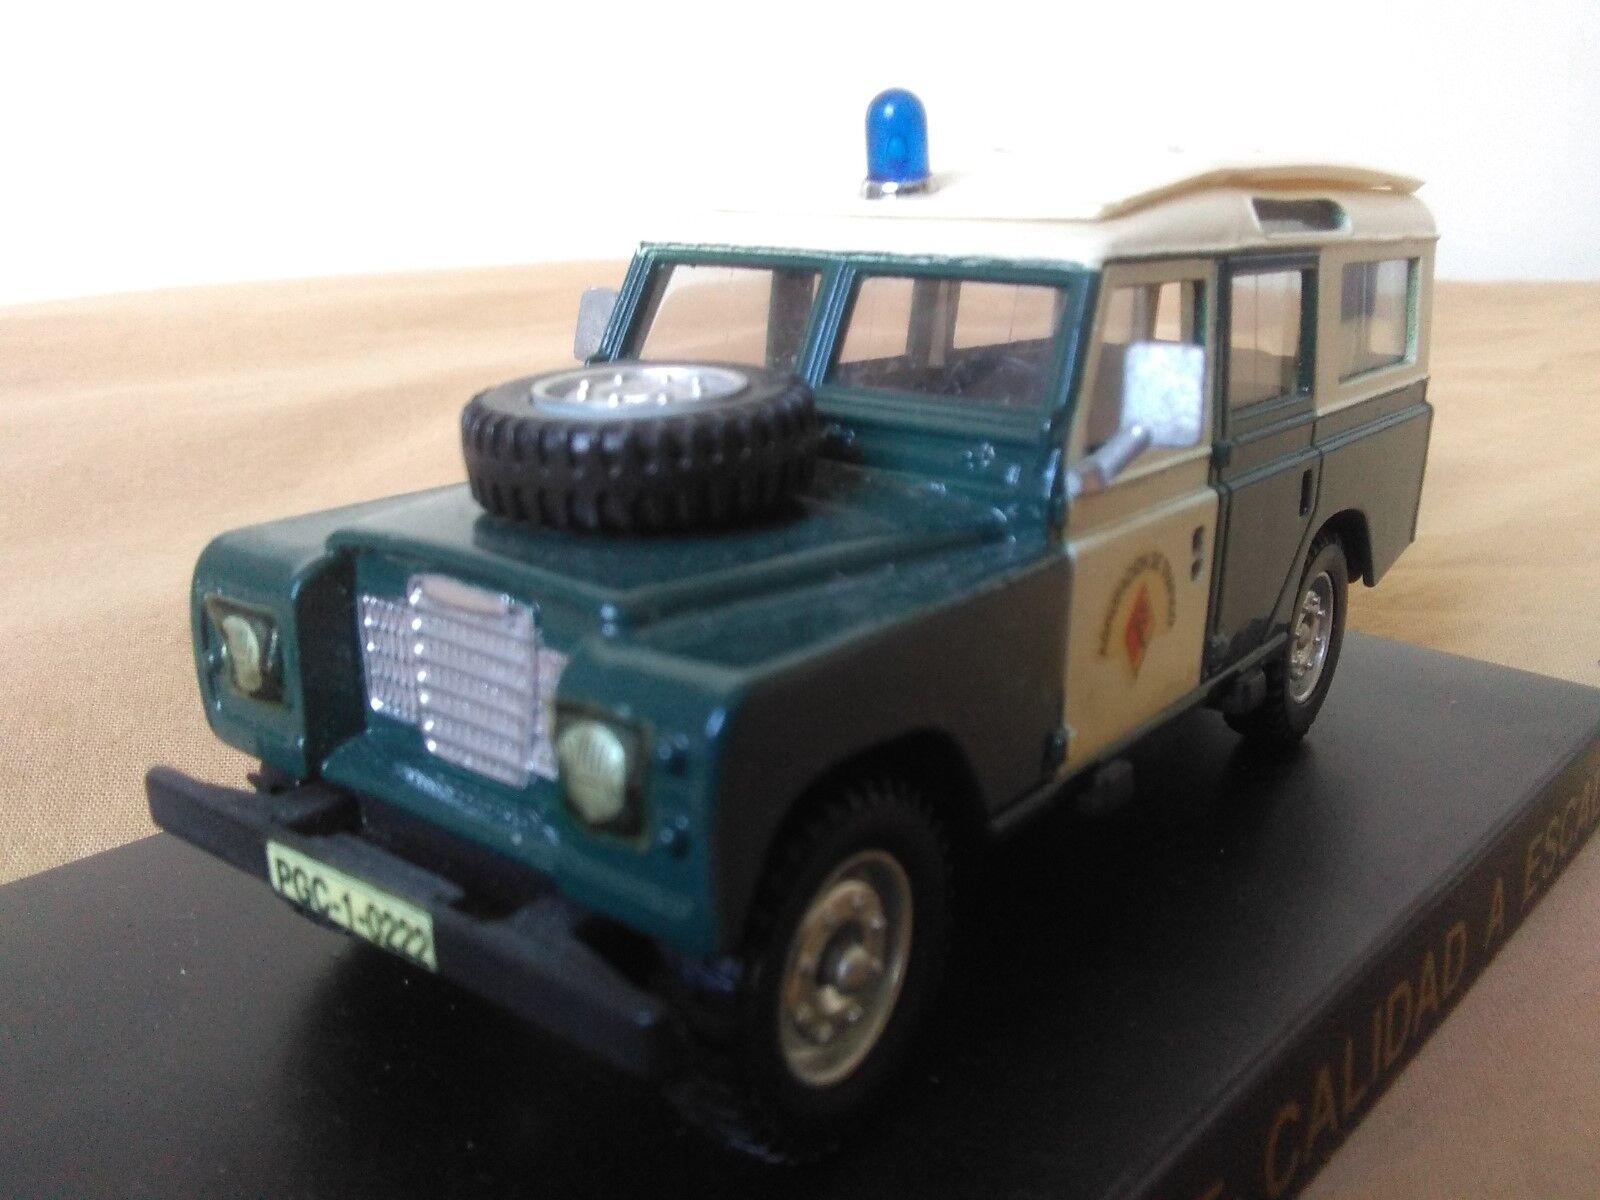 Antigua miniatura 1 43 Scale Carr PR025 Land Rover Guardia Civil.